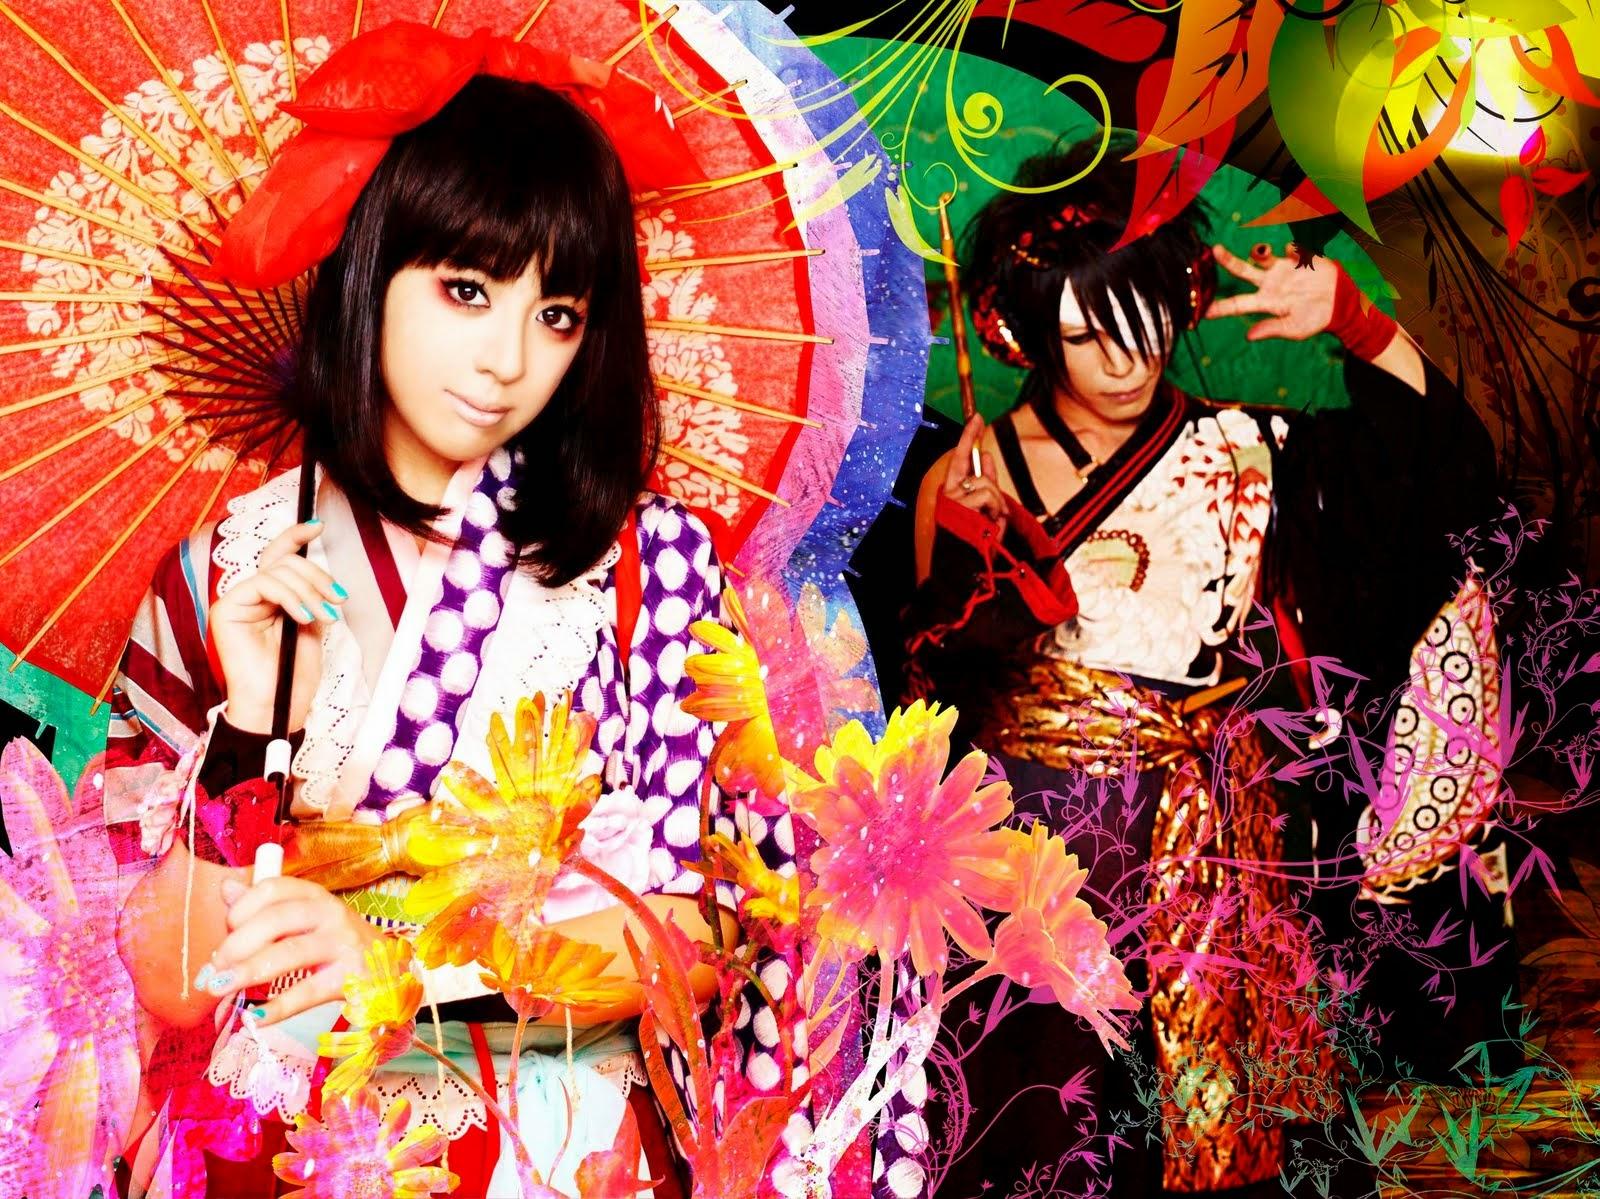 Kanon Wakeshima, anime, idol, kawaii, Kawaii Desu, Lolita,Vampire Knight